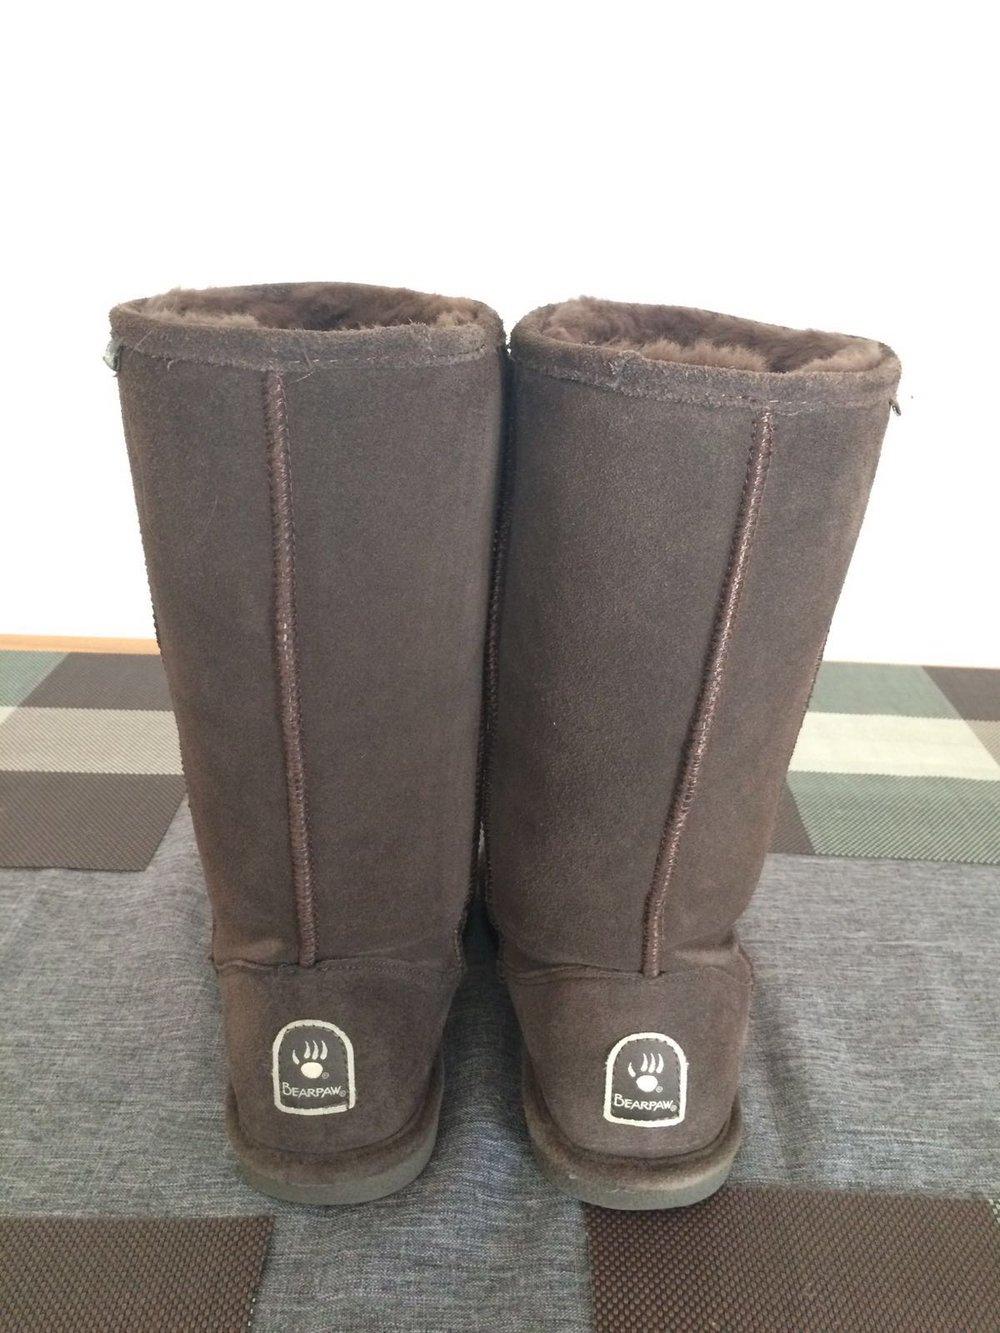 bearpaw winterstiefel wie ugg boots stiefel gr e 40 39. Black Bedroom Furniture Sets. Home Design Ideas